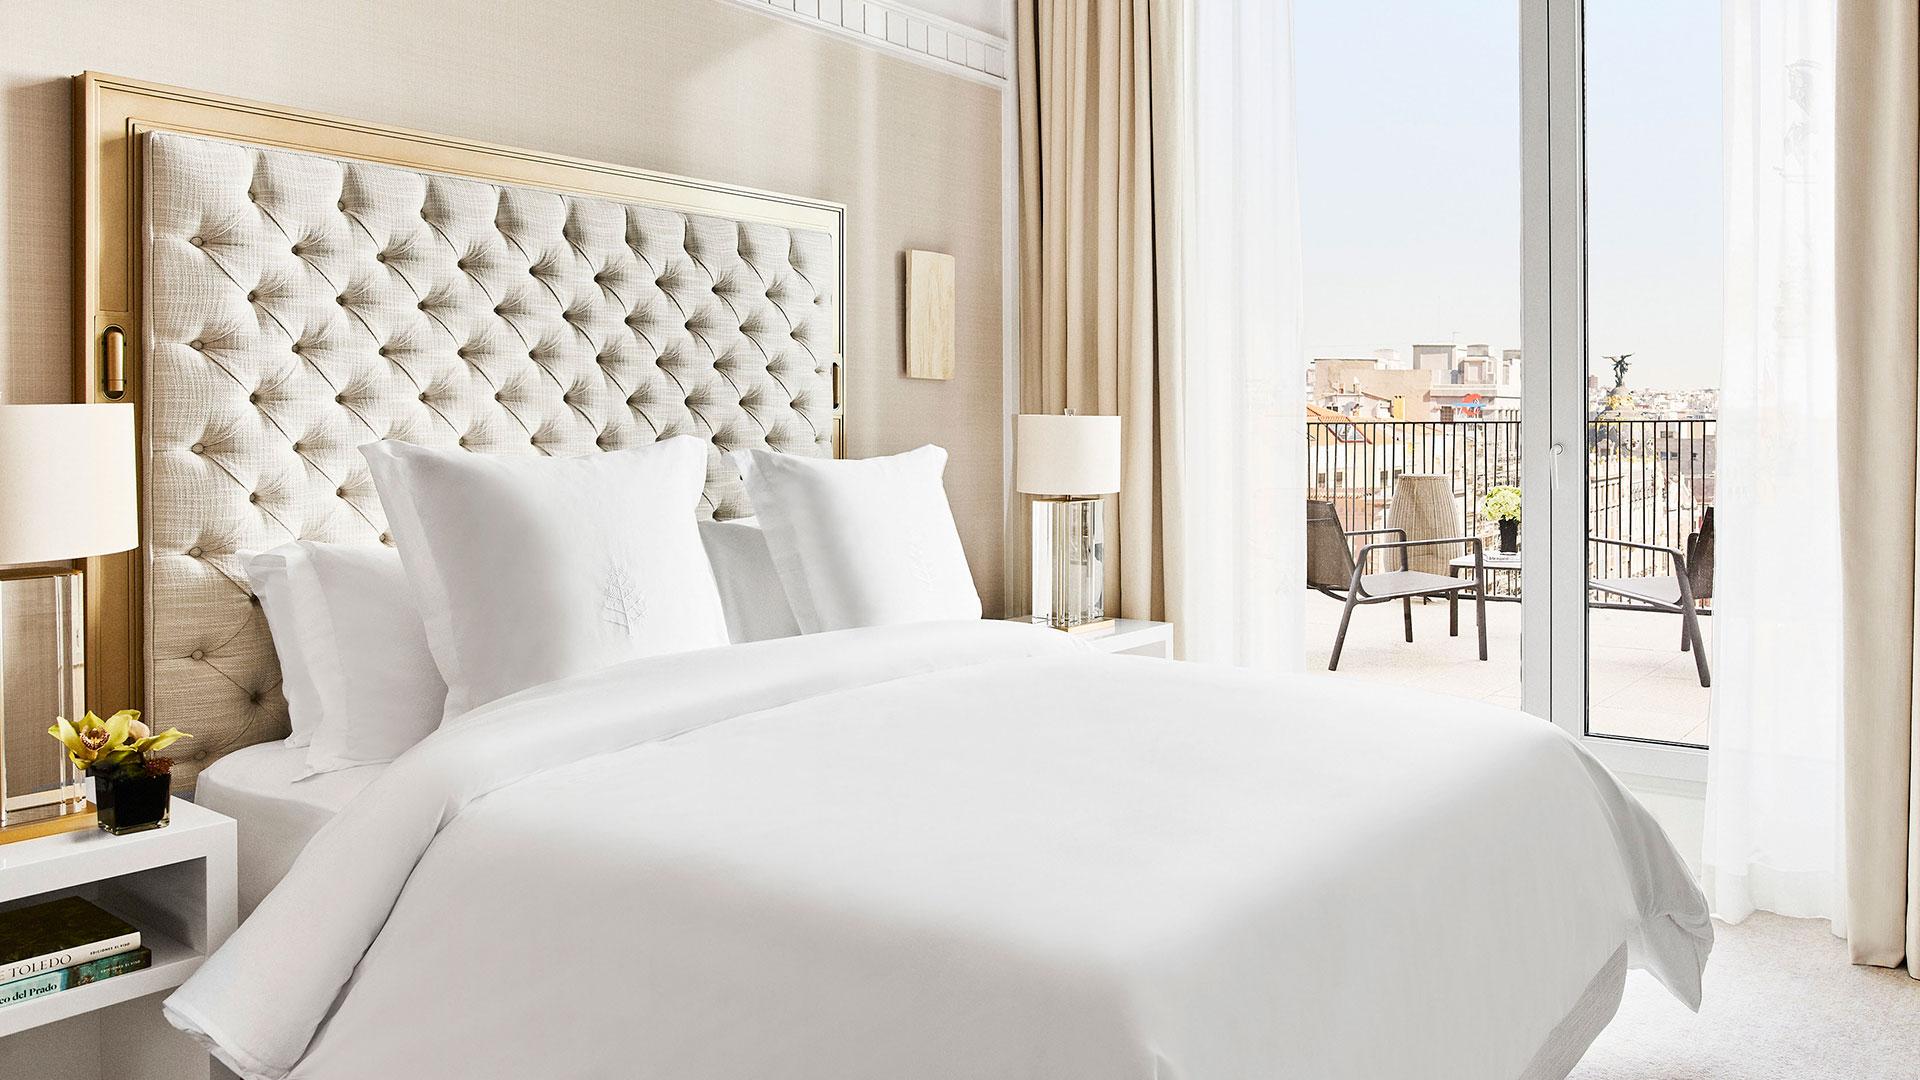 Imagen del hotel Four Seasons Madrid